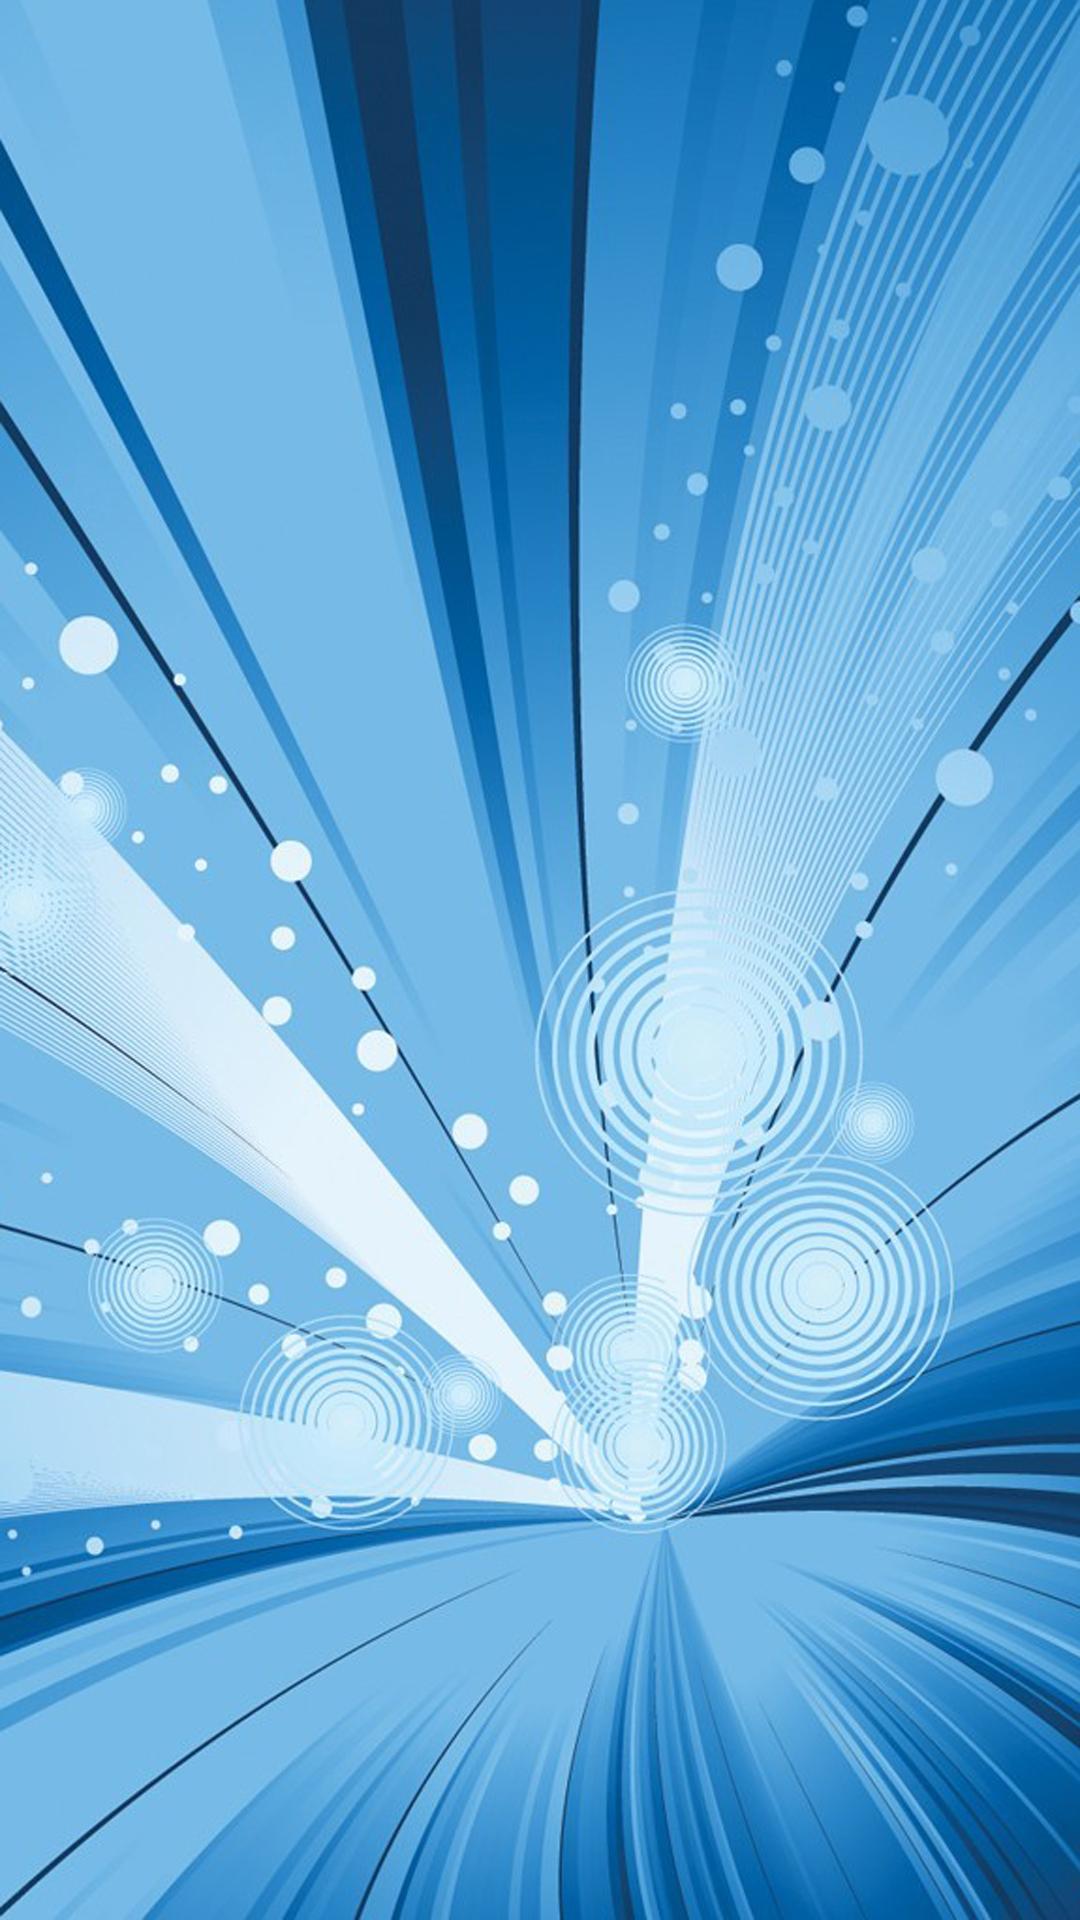 Mobile Home Screen Wallpaper Hd 4652 Hd Wallpaper